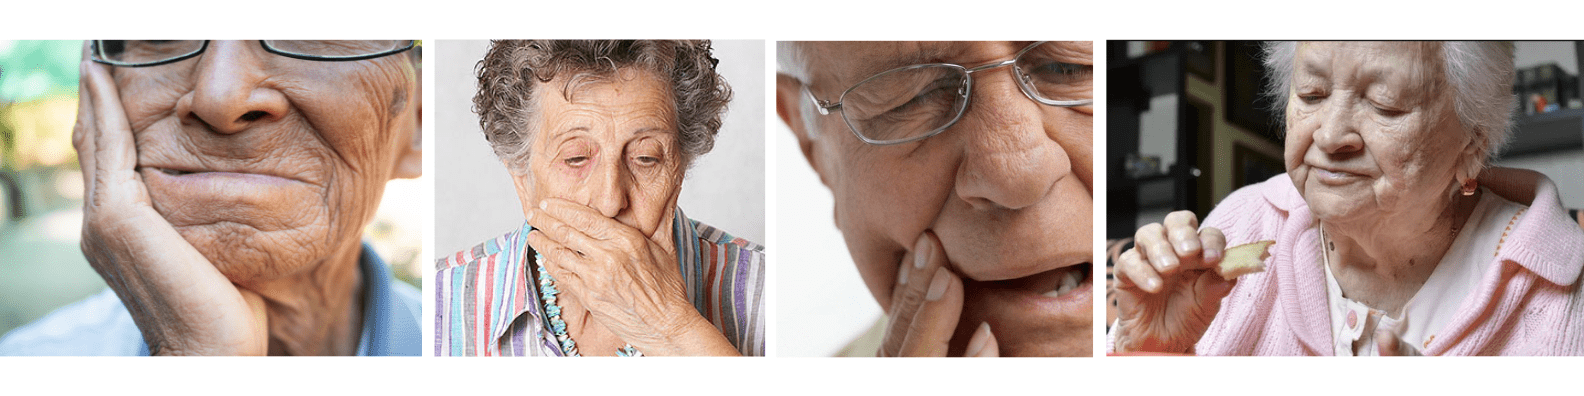 Senior dental problems